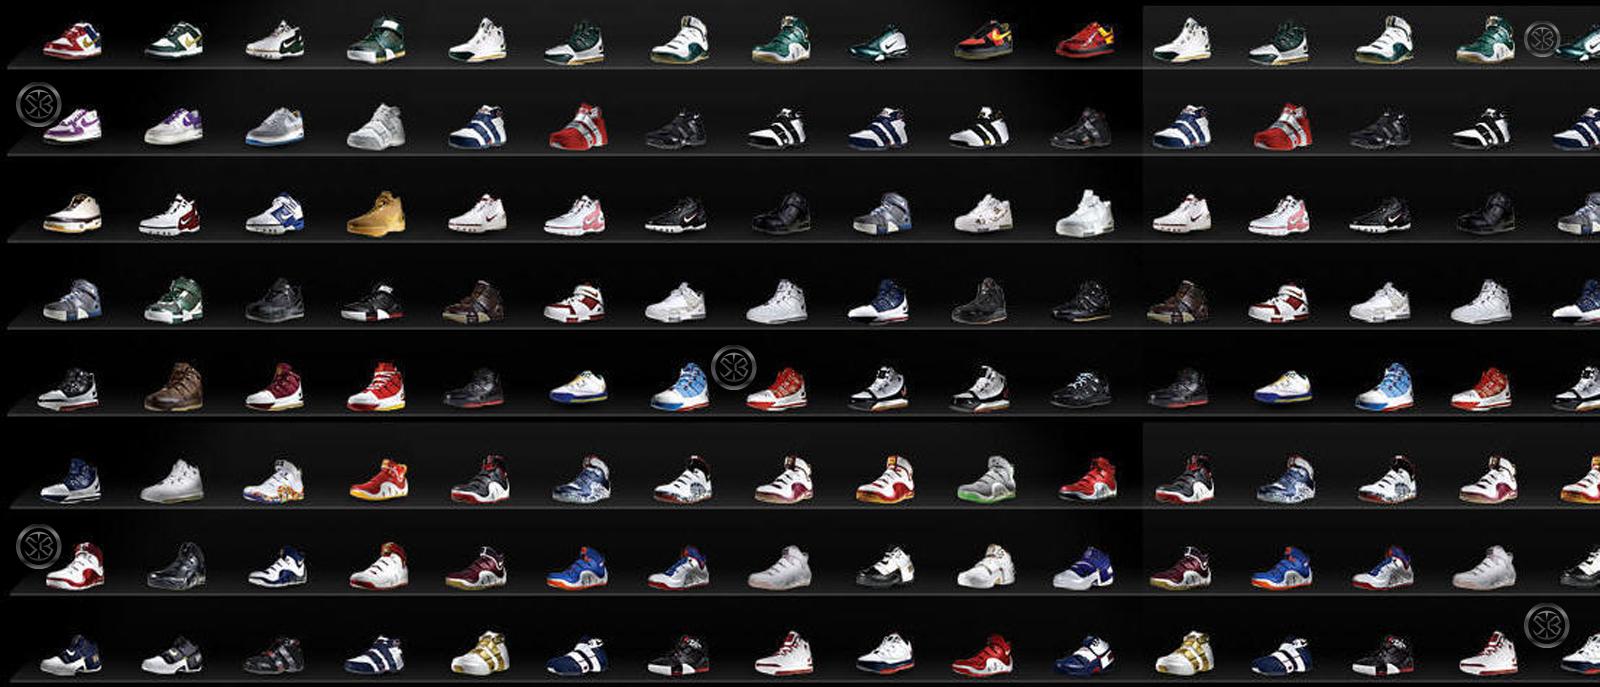 47 Jordan Shoes Wallpaper Desktop On